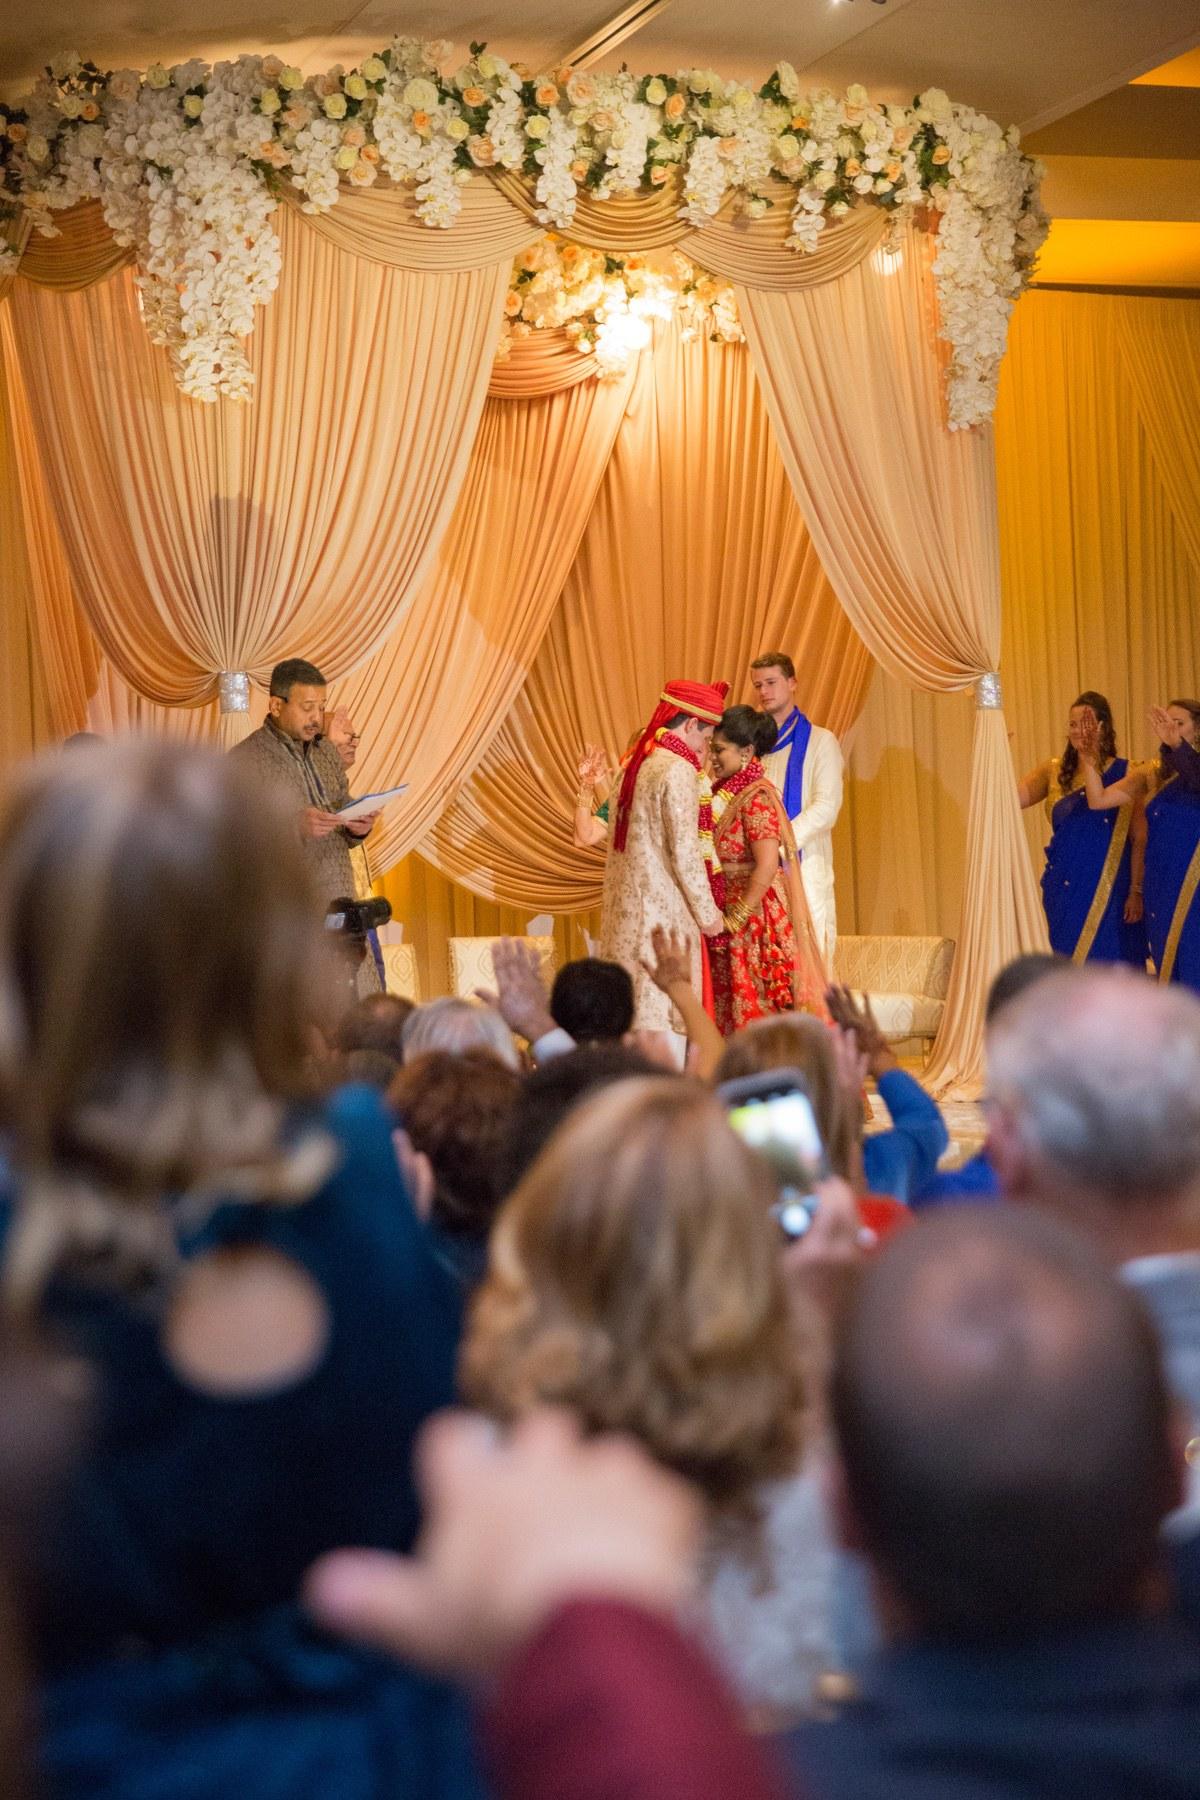 Le Cape Weddings - South Asian Wedding - Trisha and Jordan - Ceremony -133.jpg